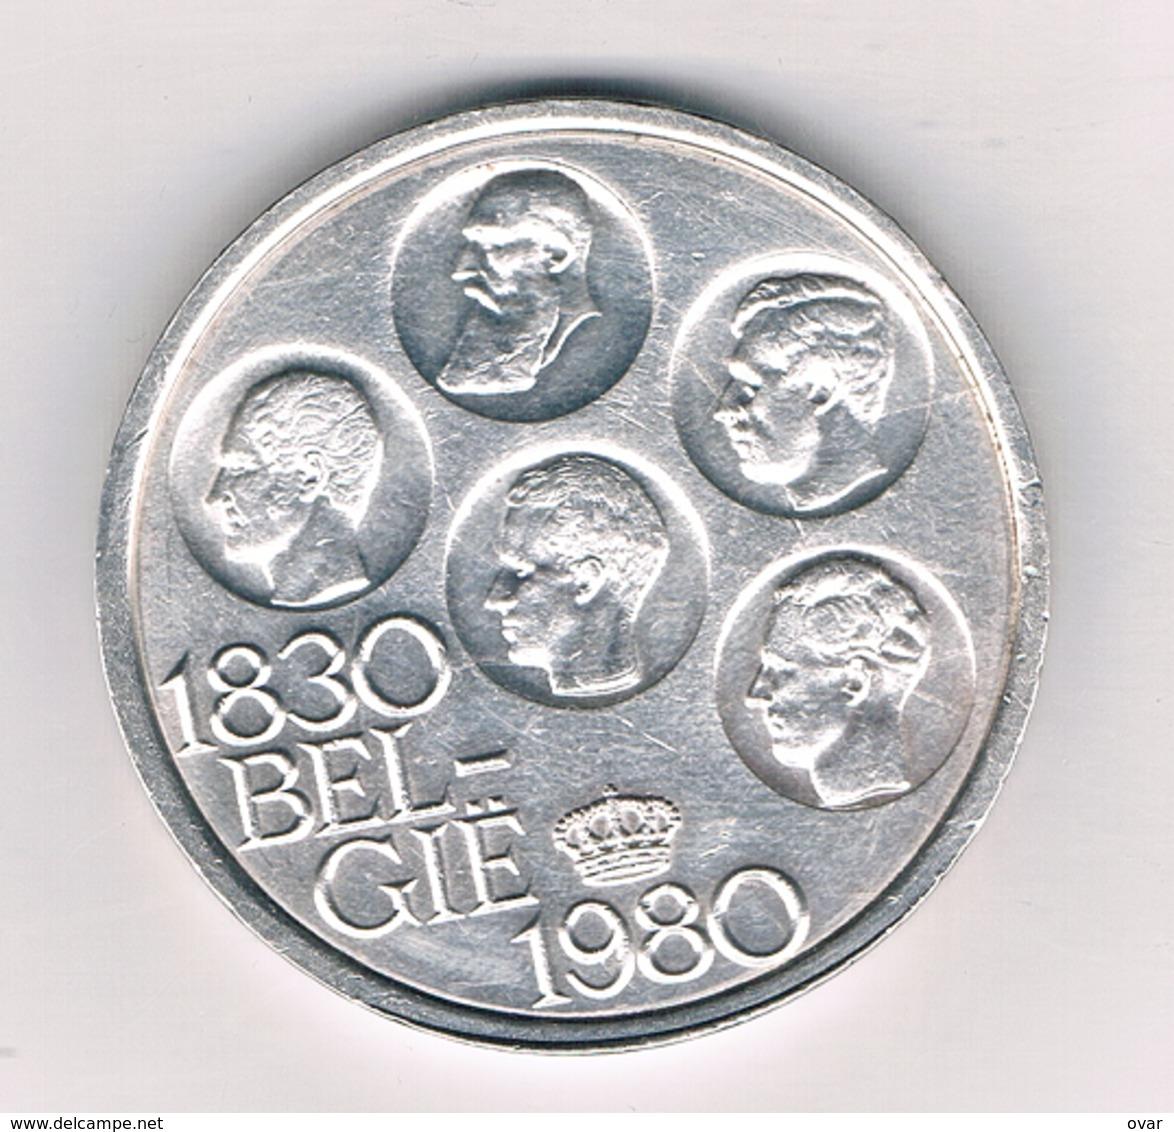 500 FRANK 1980 VL BELGIE /8888/ - 1951-1993: Baudouin I